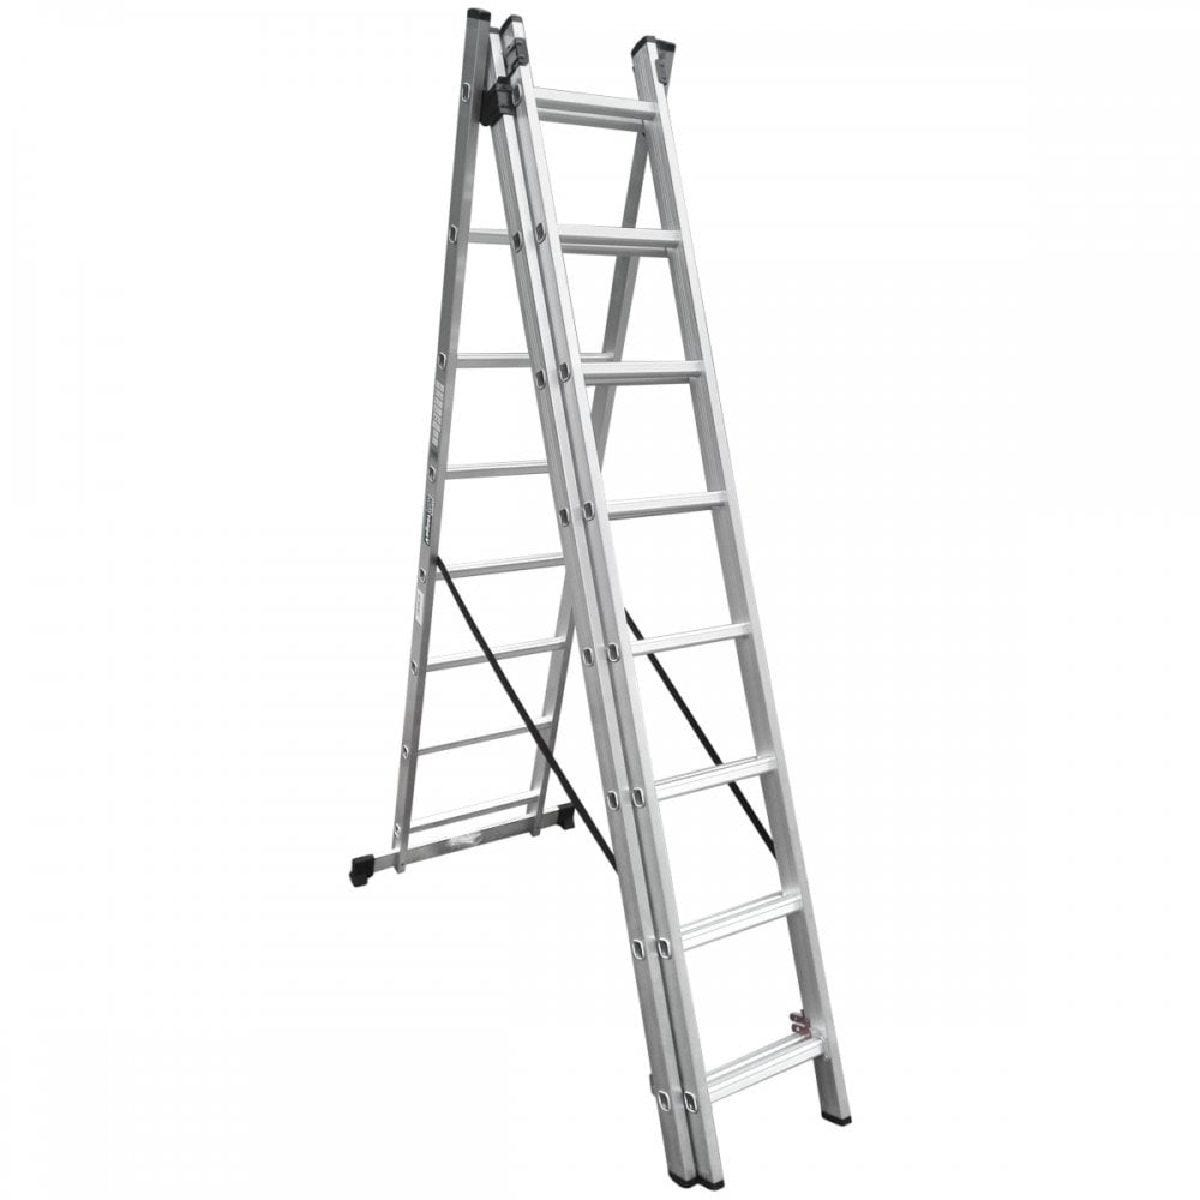 Charles Bentley 3 Section 3 Way Combination Ladder - 3X8 Rung Aluminium